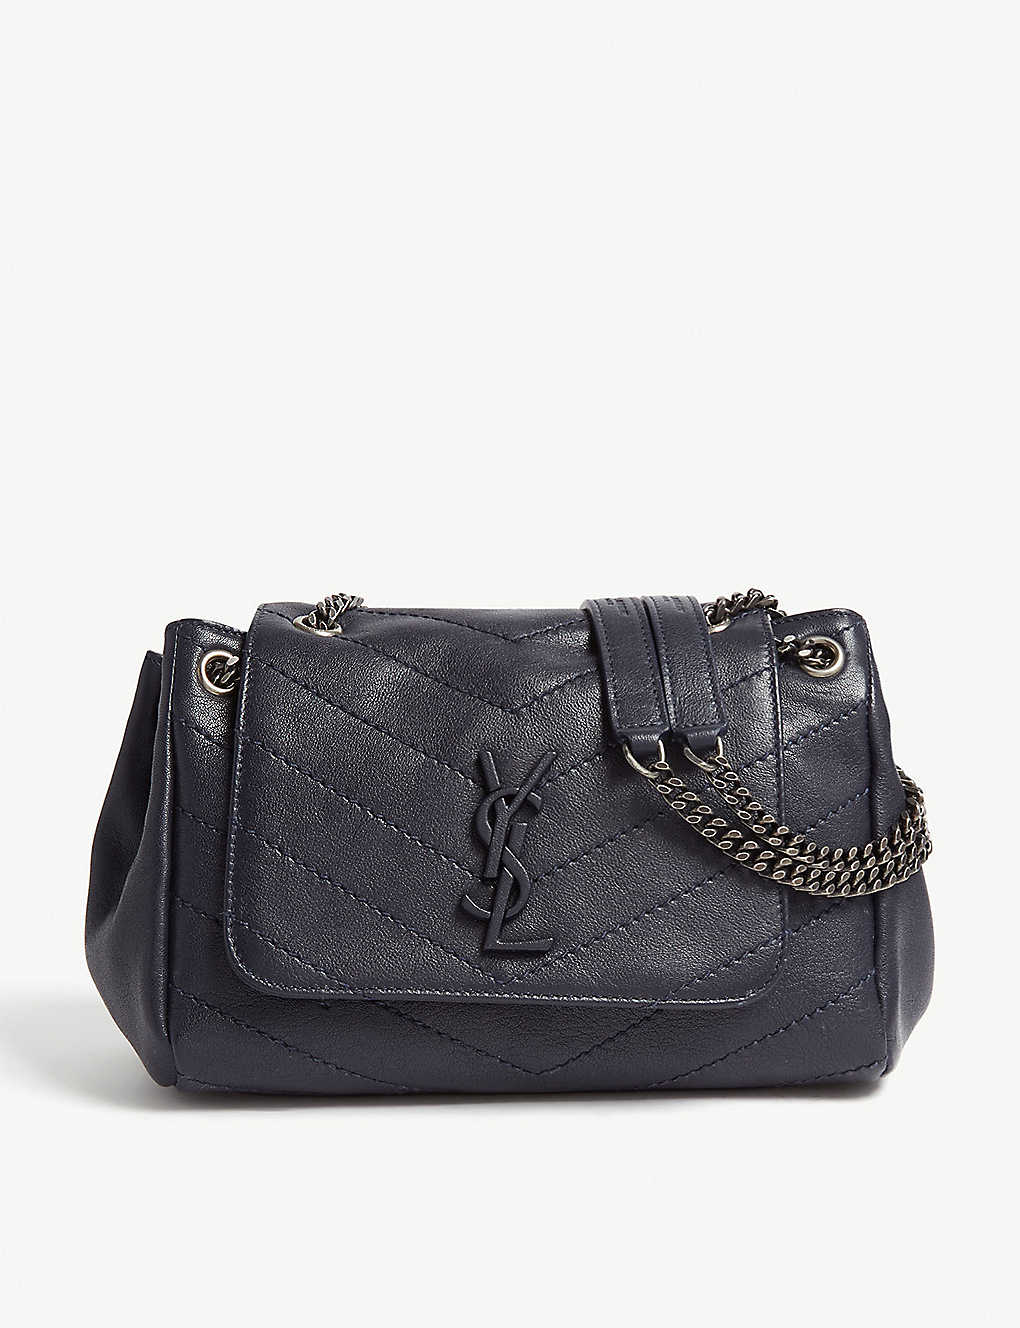 e553ec56bd Nolita monogram small leather shoulder bag - Midnight blue ...